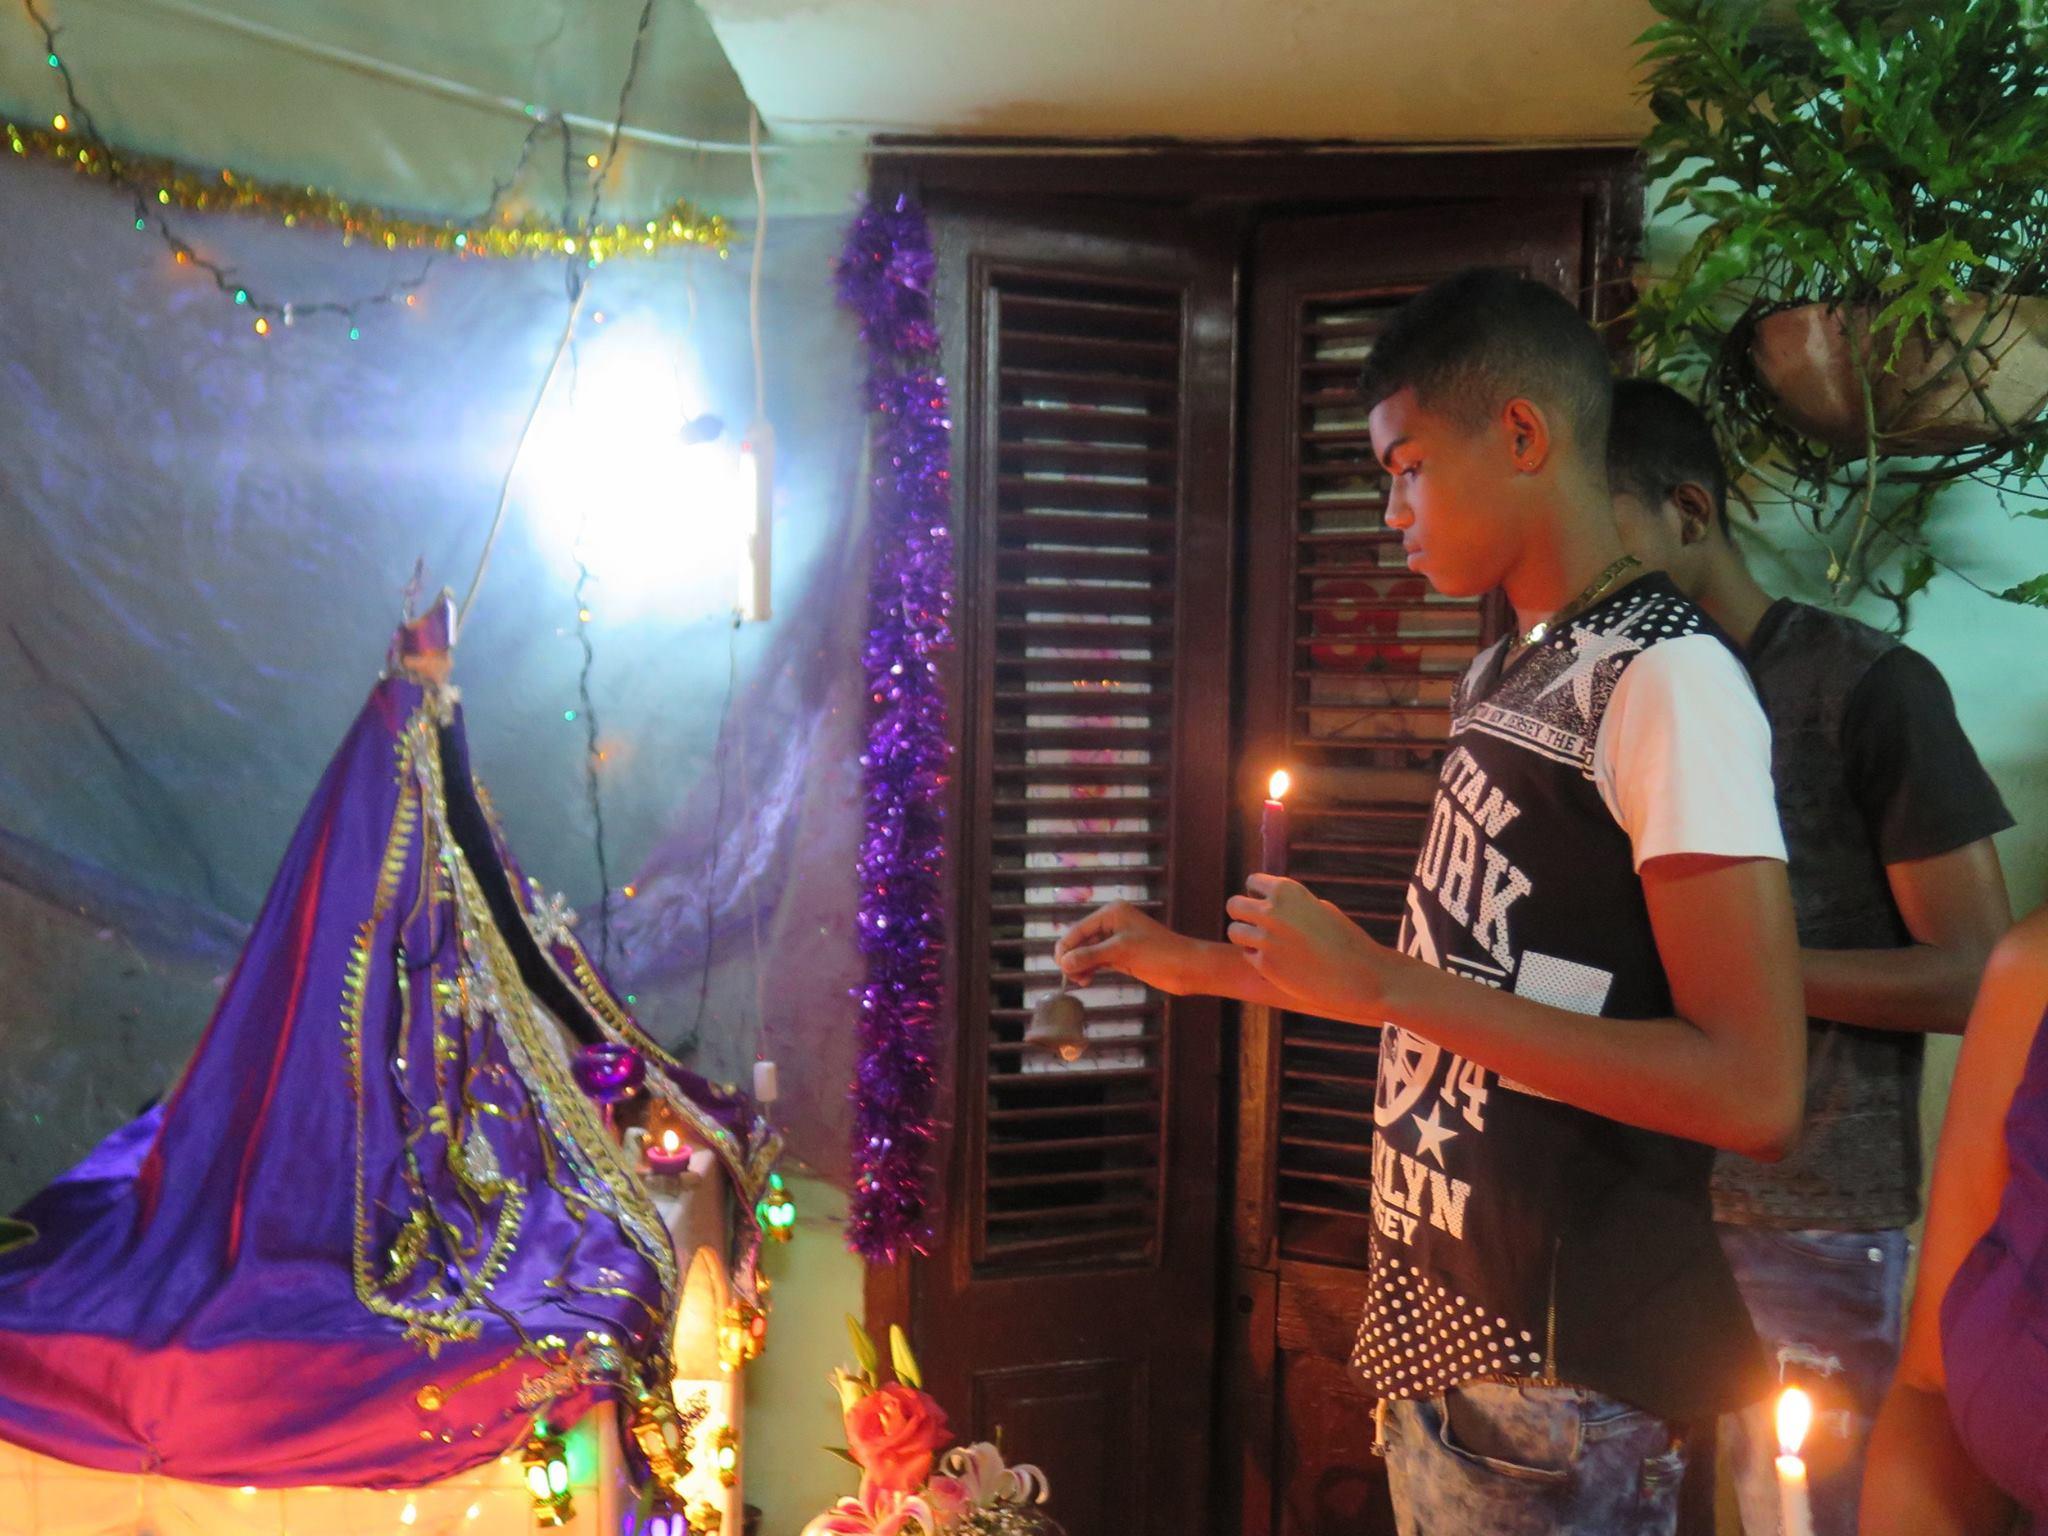 san lazaro, saint lazaro, celebration, worship, religion, santeria, catholicism, catholic, cuba, cuban, cuban streets, cuban celebration, streets of cuba, saint, patron saint of suffering, caribbean island, worshippers, boy, streets of cuba, cuban street altar, altar, candles